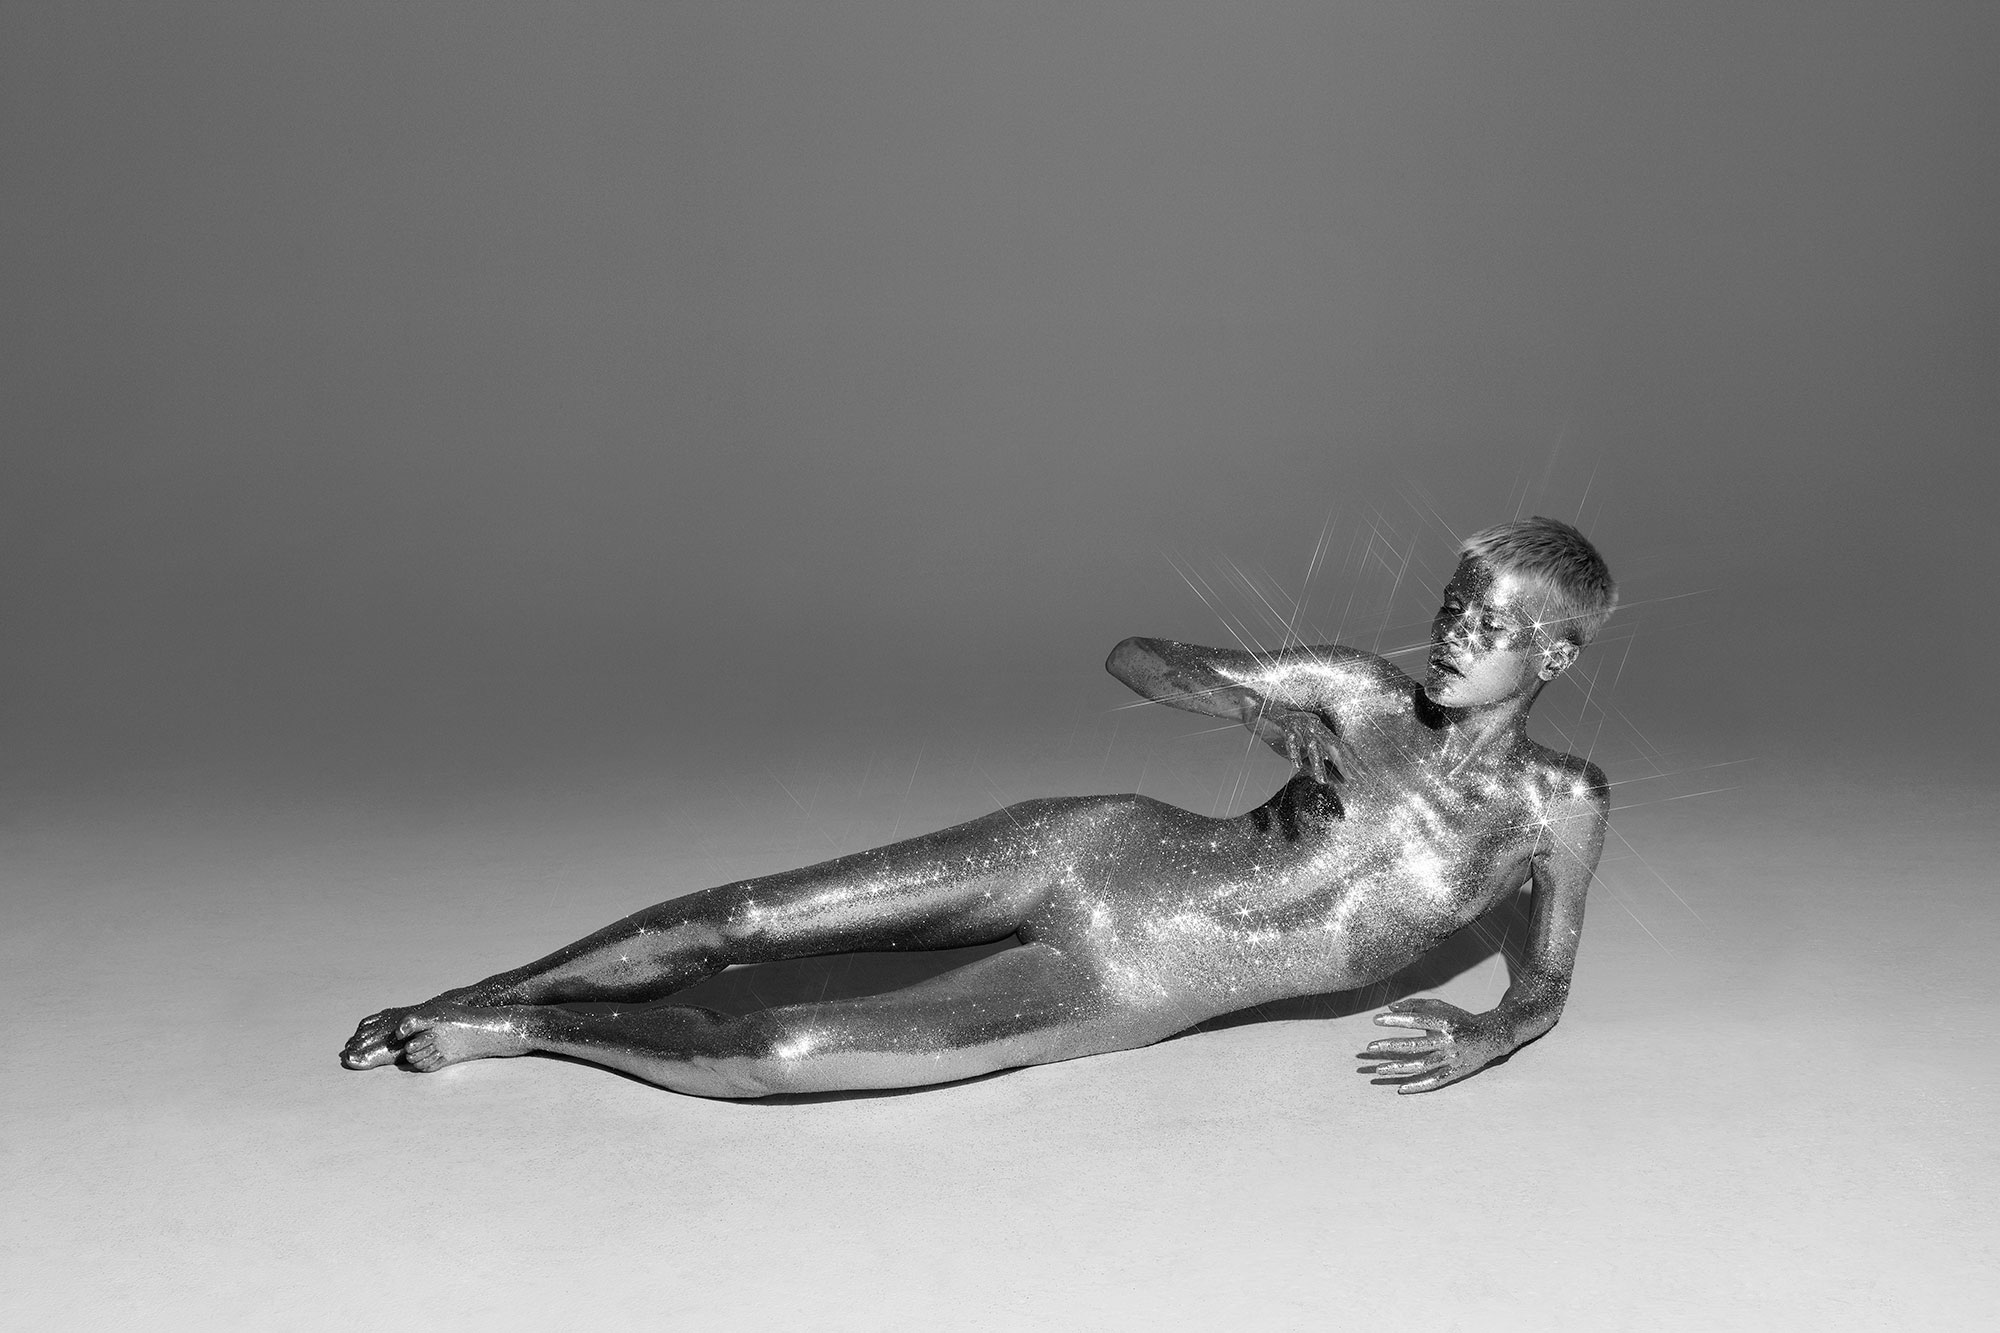 Kris_Gottschalk-Nagi_Sakai-Models-01.jpg